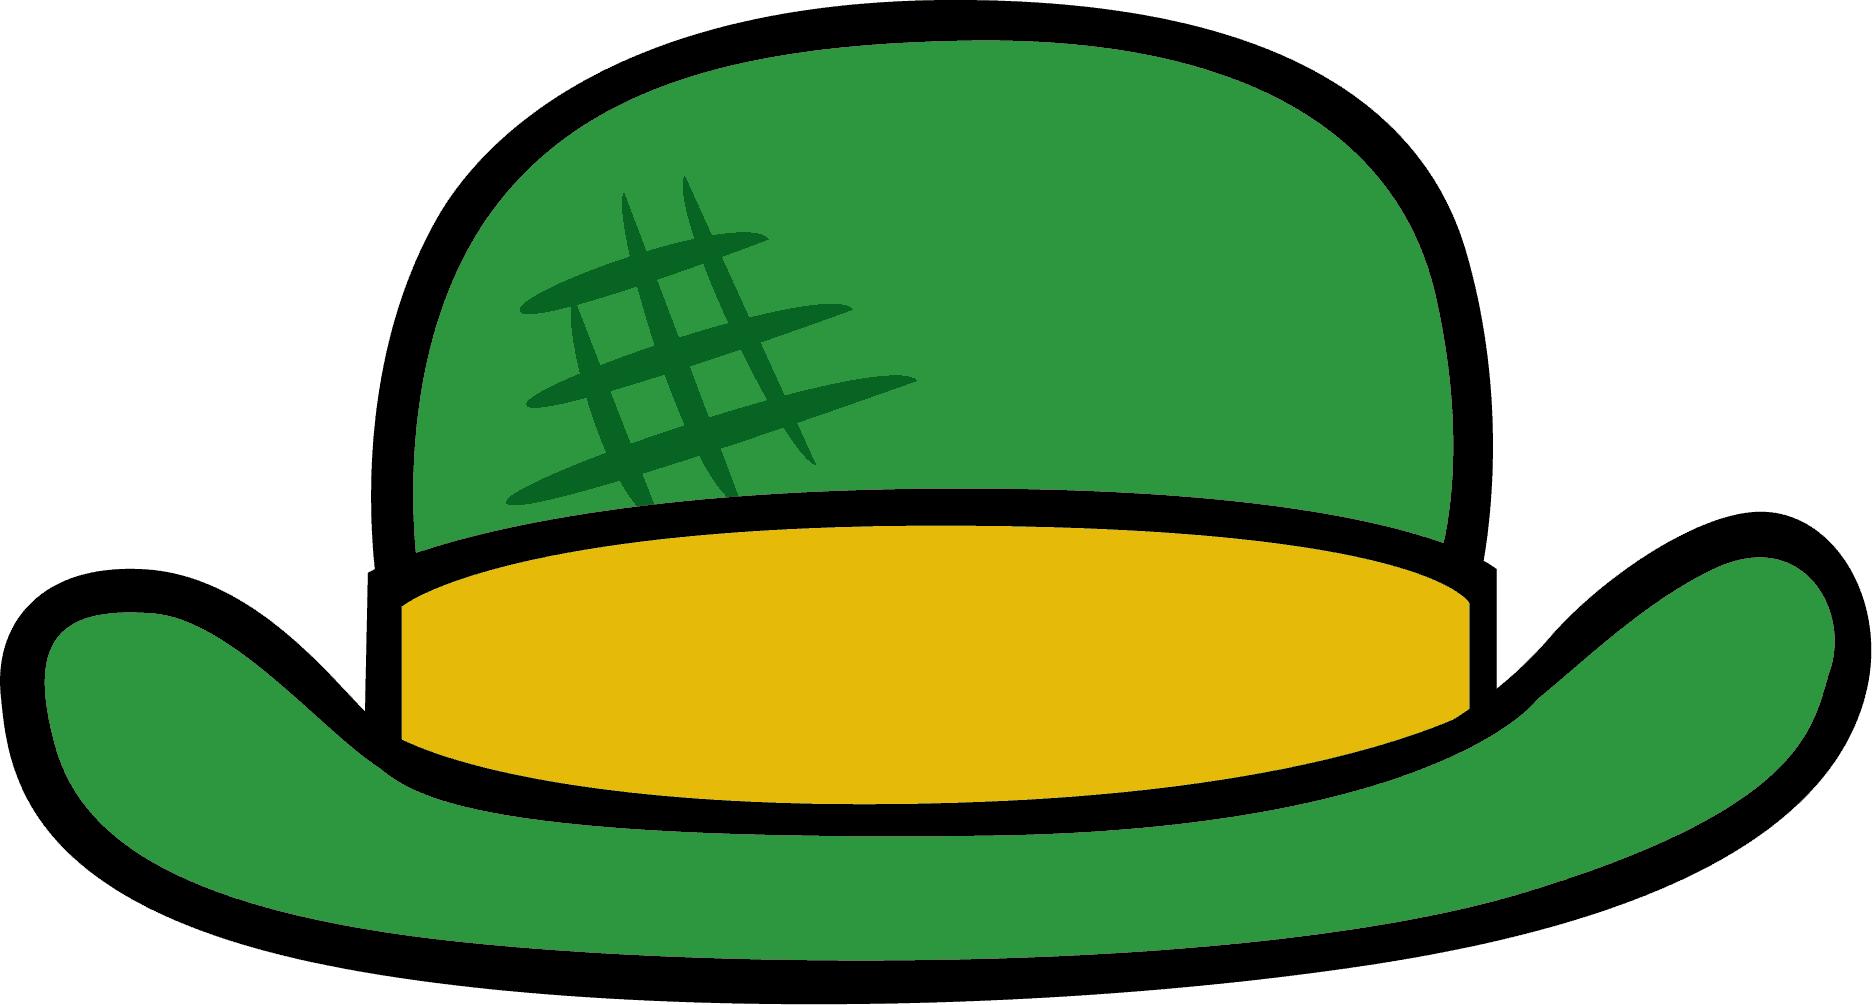 Fedora clipart spy hat. Clip art borders panda